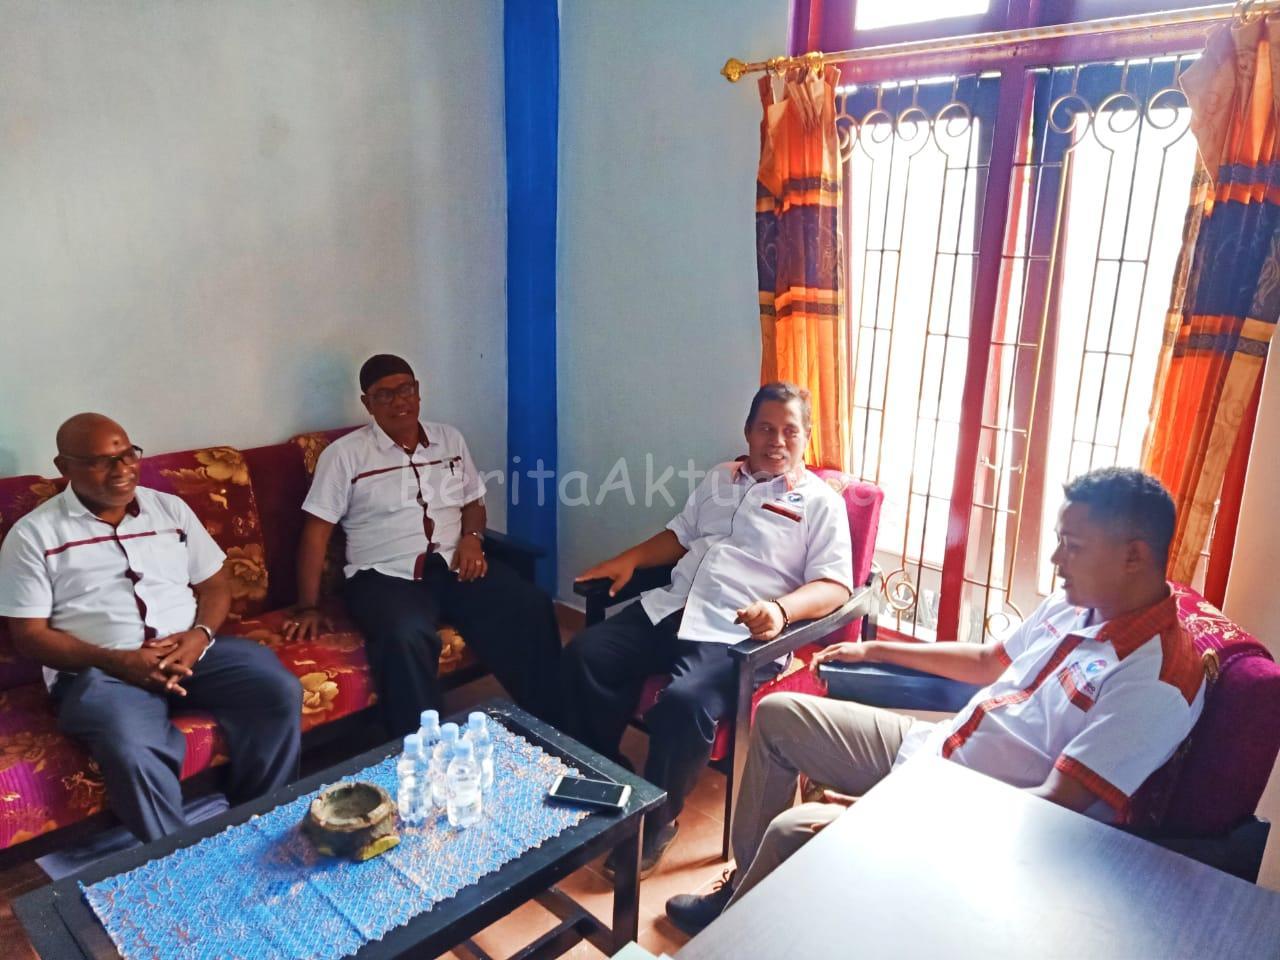 Siap Maju Pilkada 2020, Pasangan BW Mendaftar di DPD Perindo Manokwari 18 IMG 20200708 WA0039